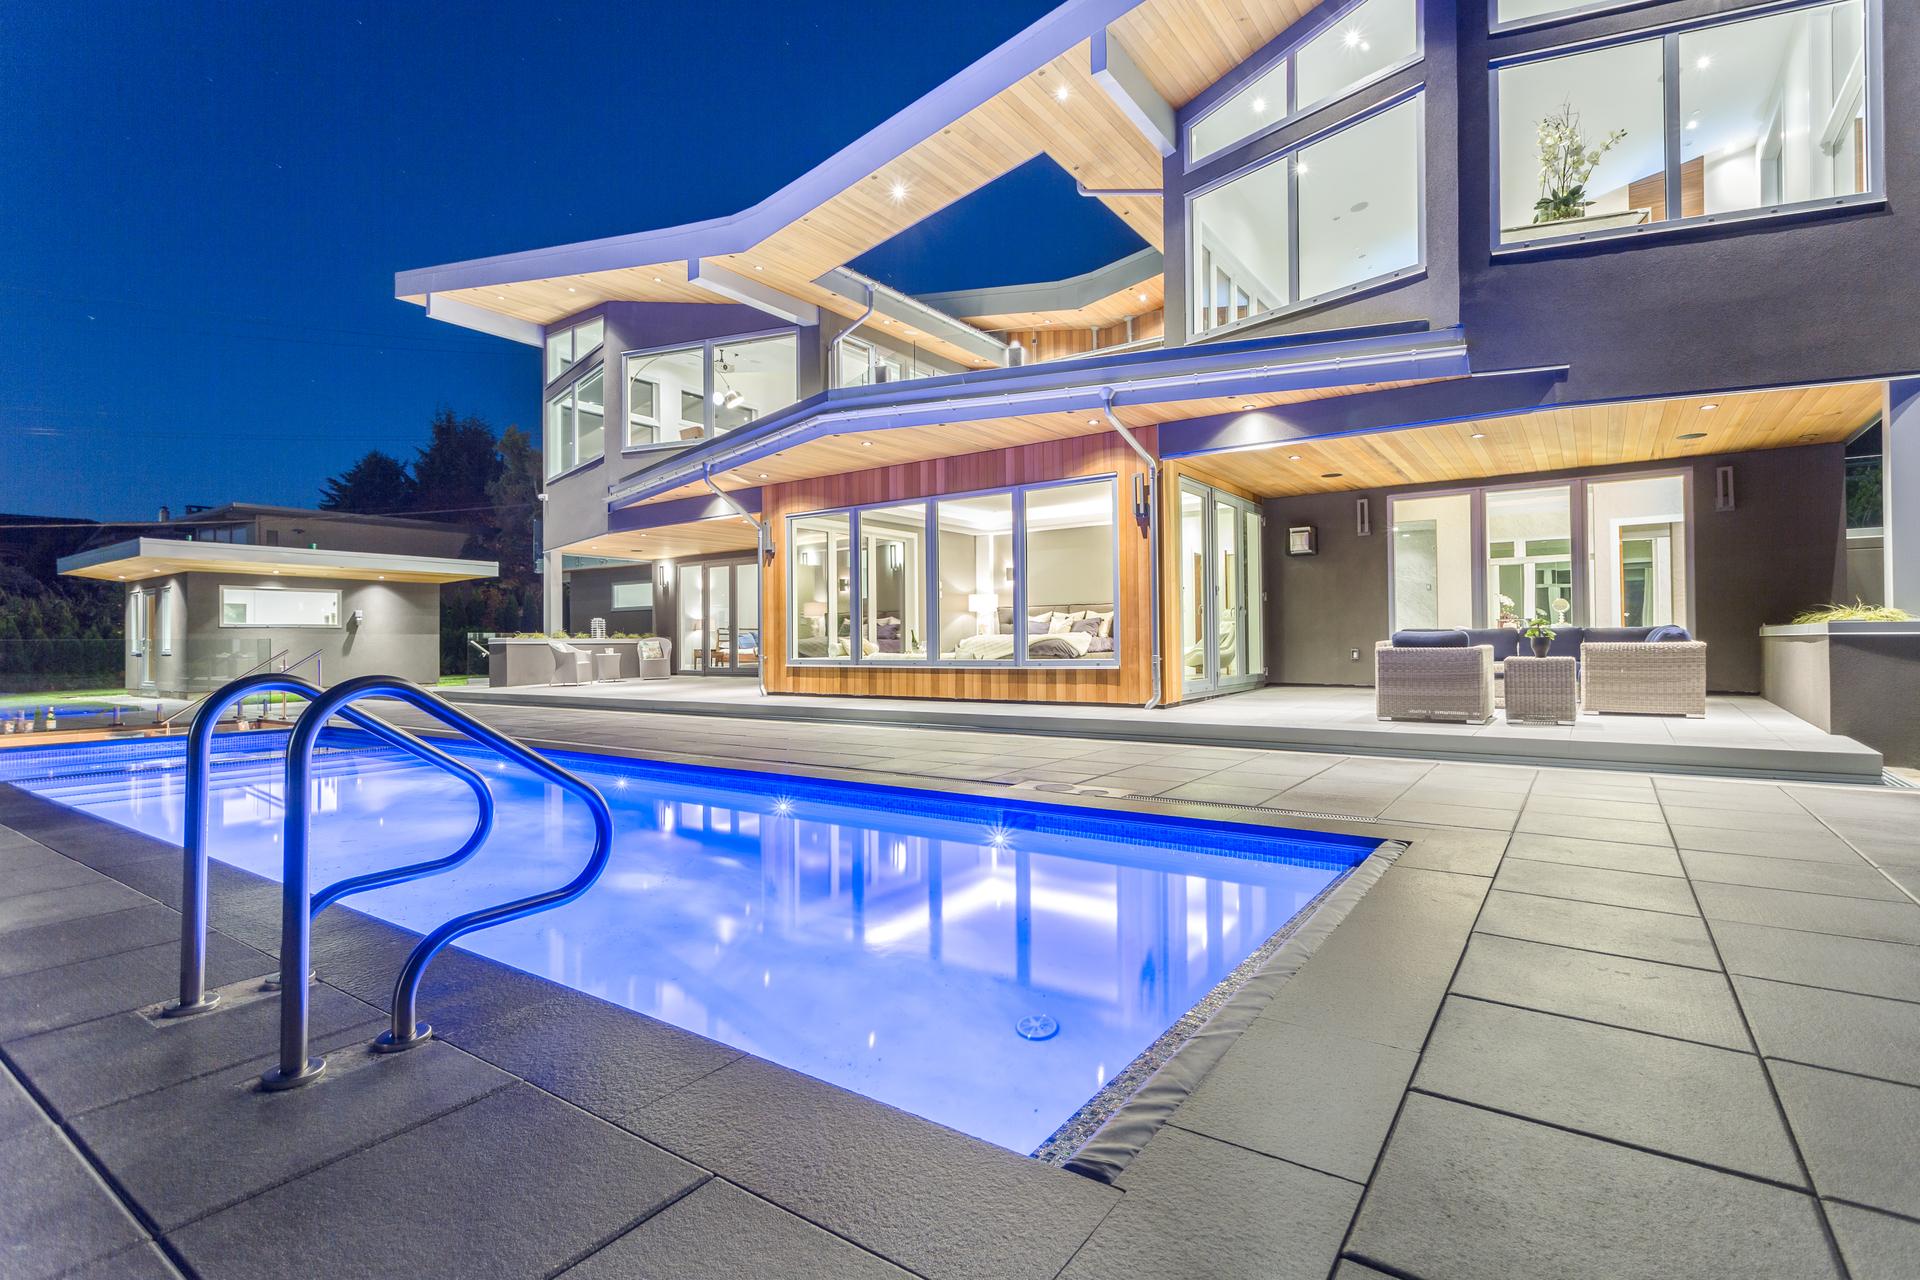 665-greenwood-rd-360hometours-11 at 665 Greenwood Road, British Properties, West Vancouver